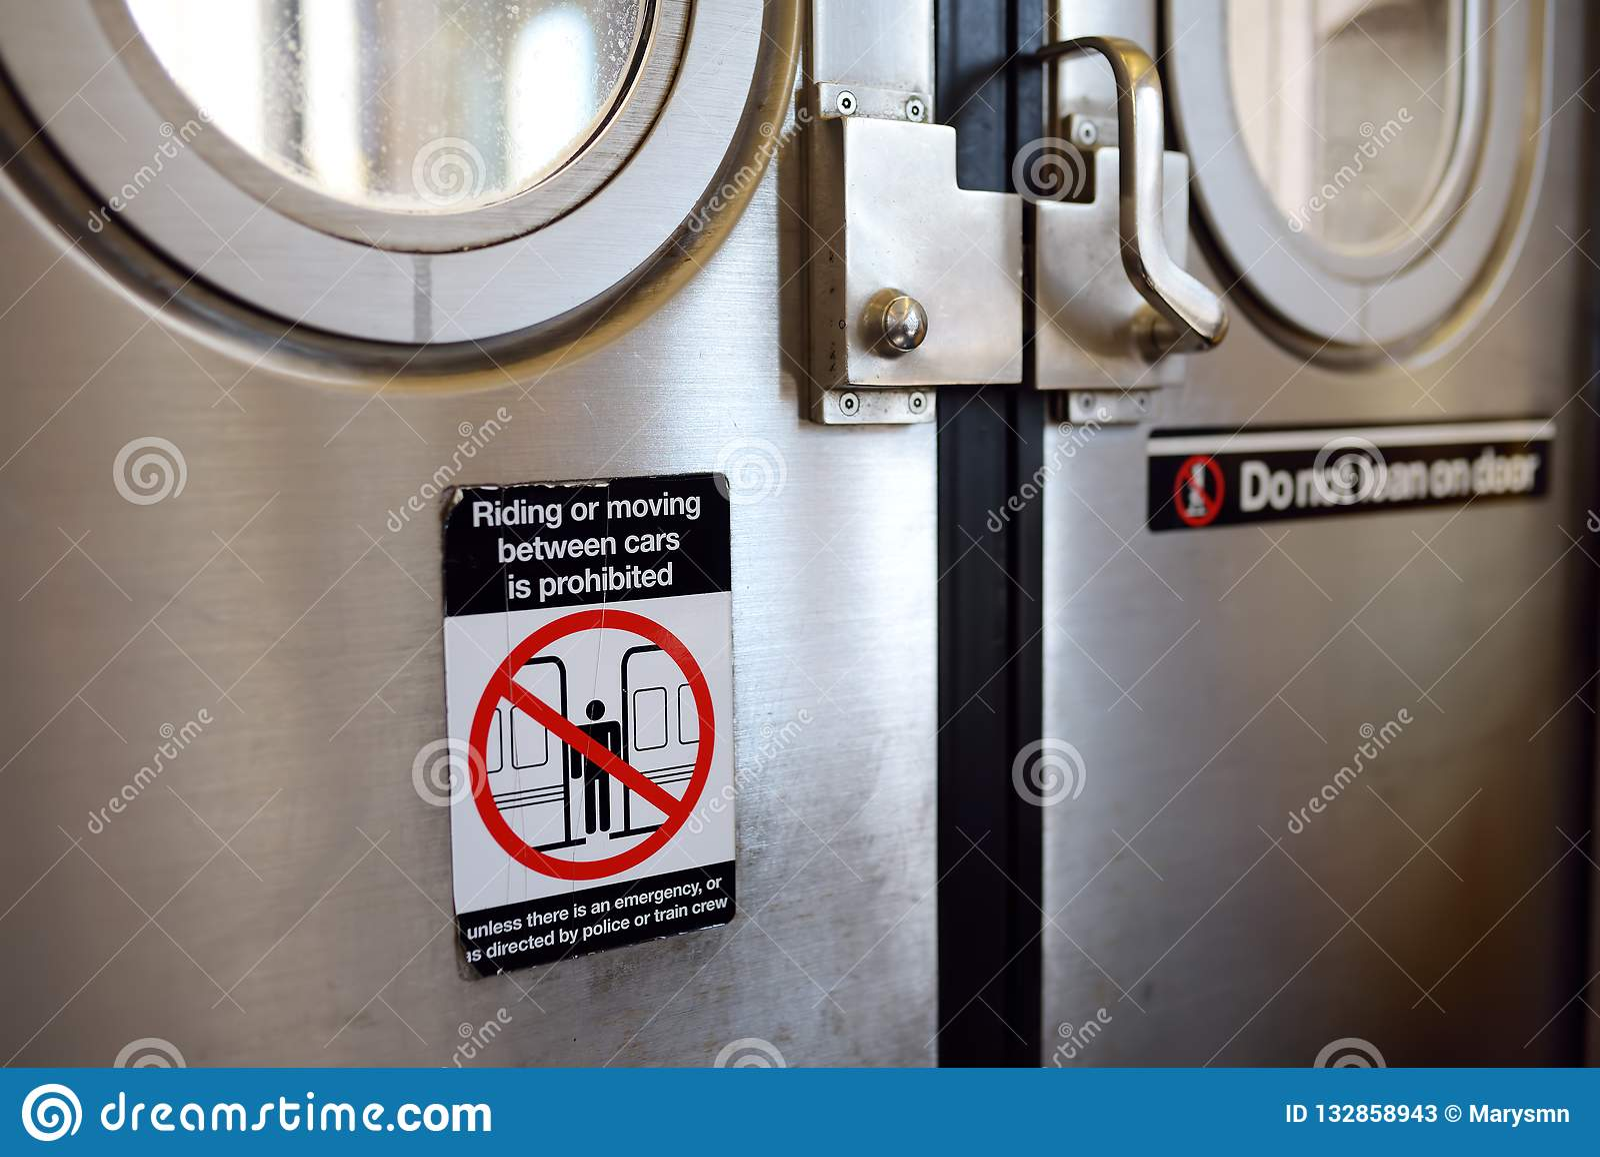 Subway Train Doors And Windows In New York Stock Image ...